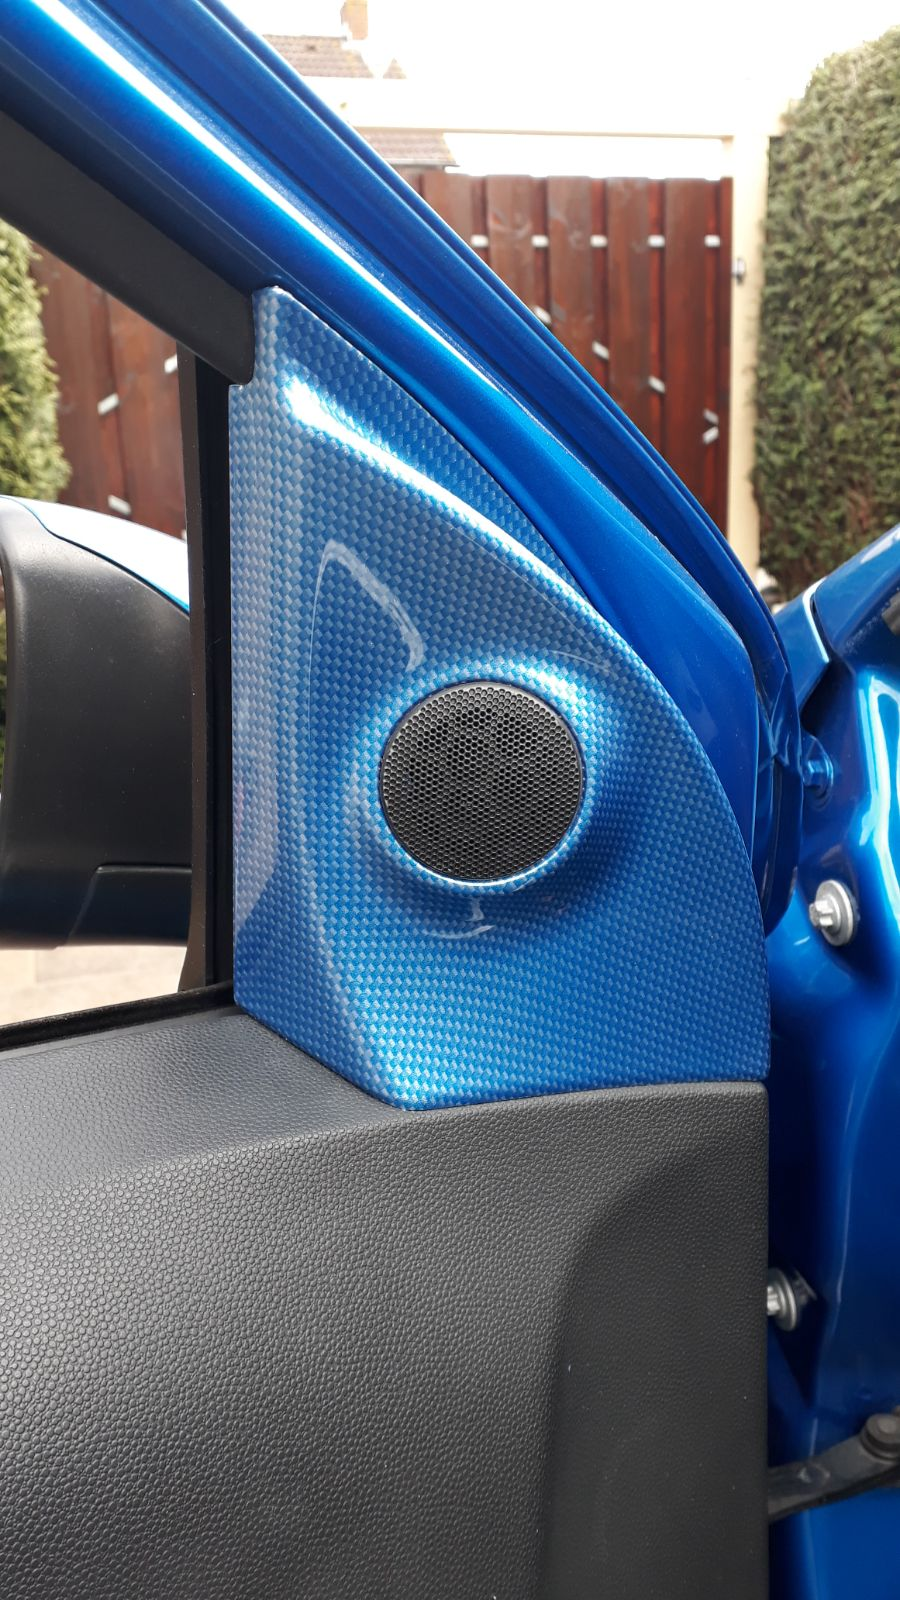 Opel astra opc blauw carbon hydrodip www.fsb-dip.nl hydrodipping